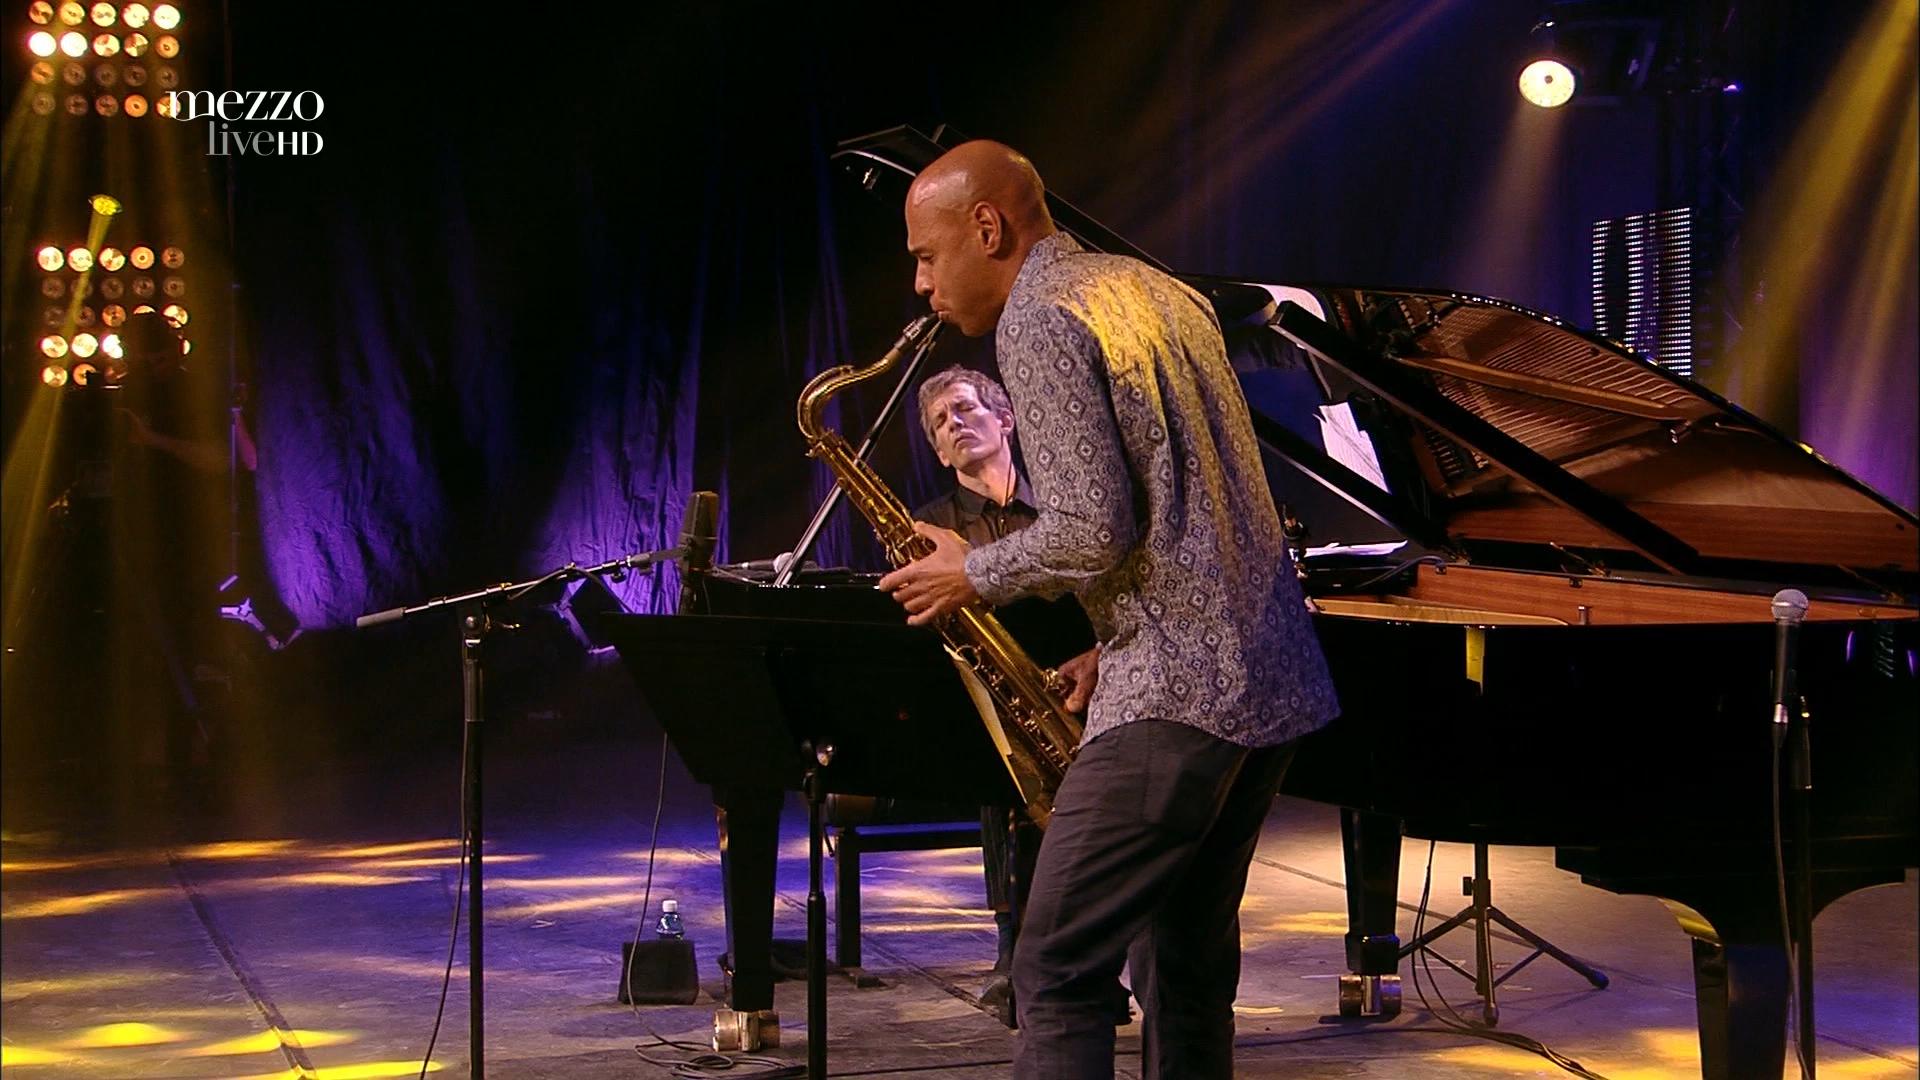 2011 Joshua Redman & Brad Mehldau - Jazz in Marciac [HDTV 1080i] 0